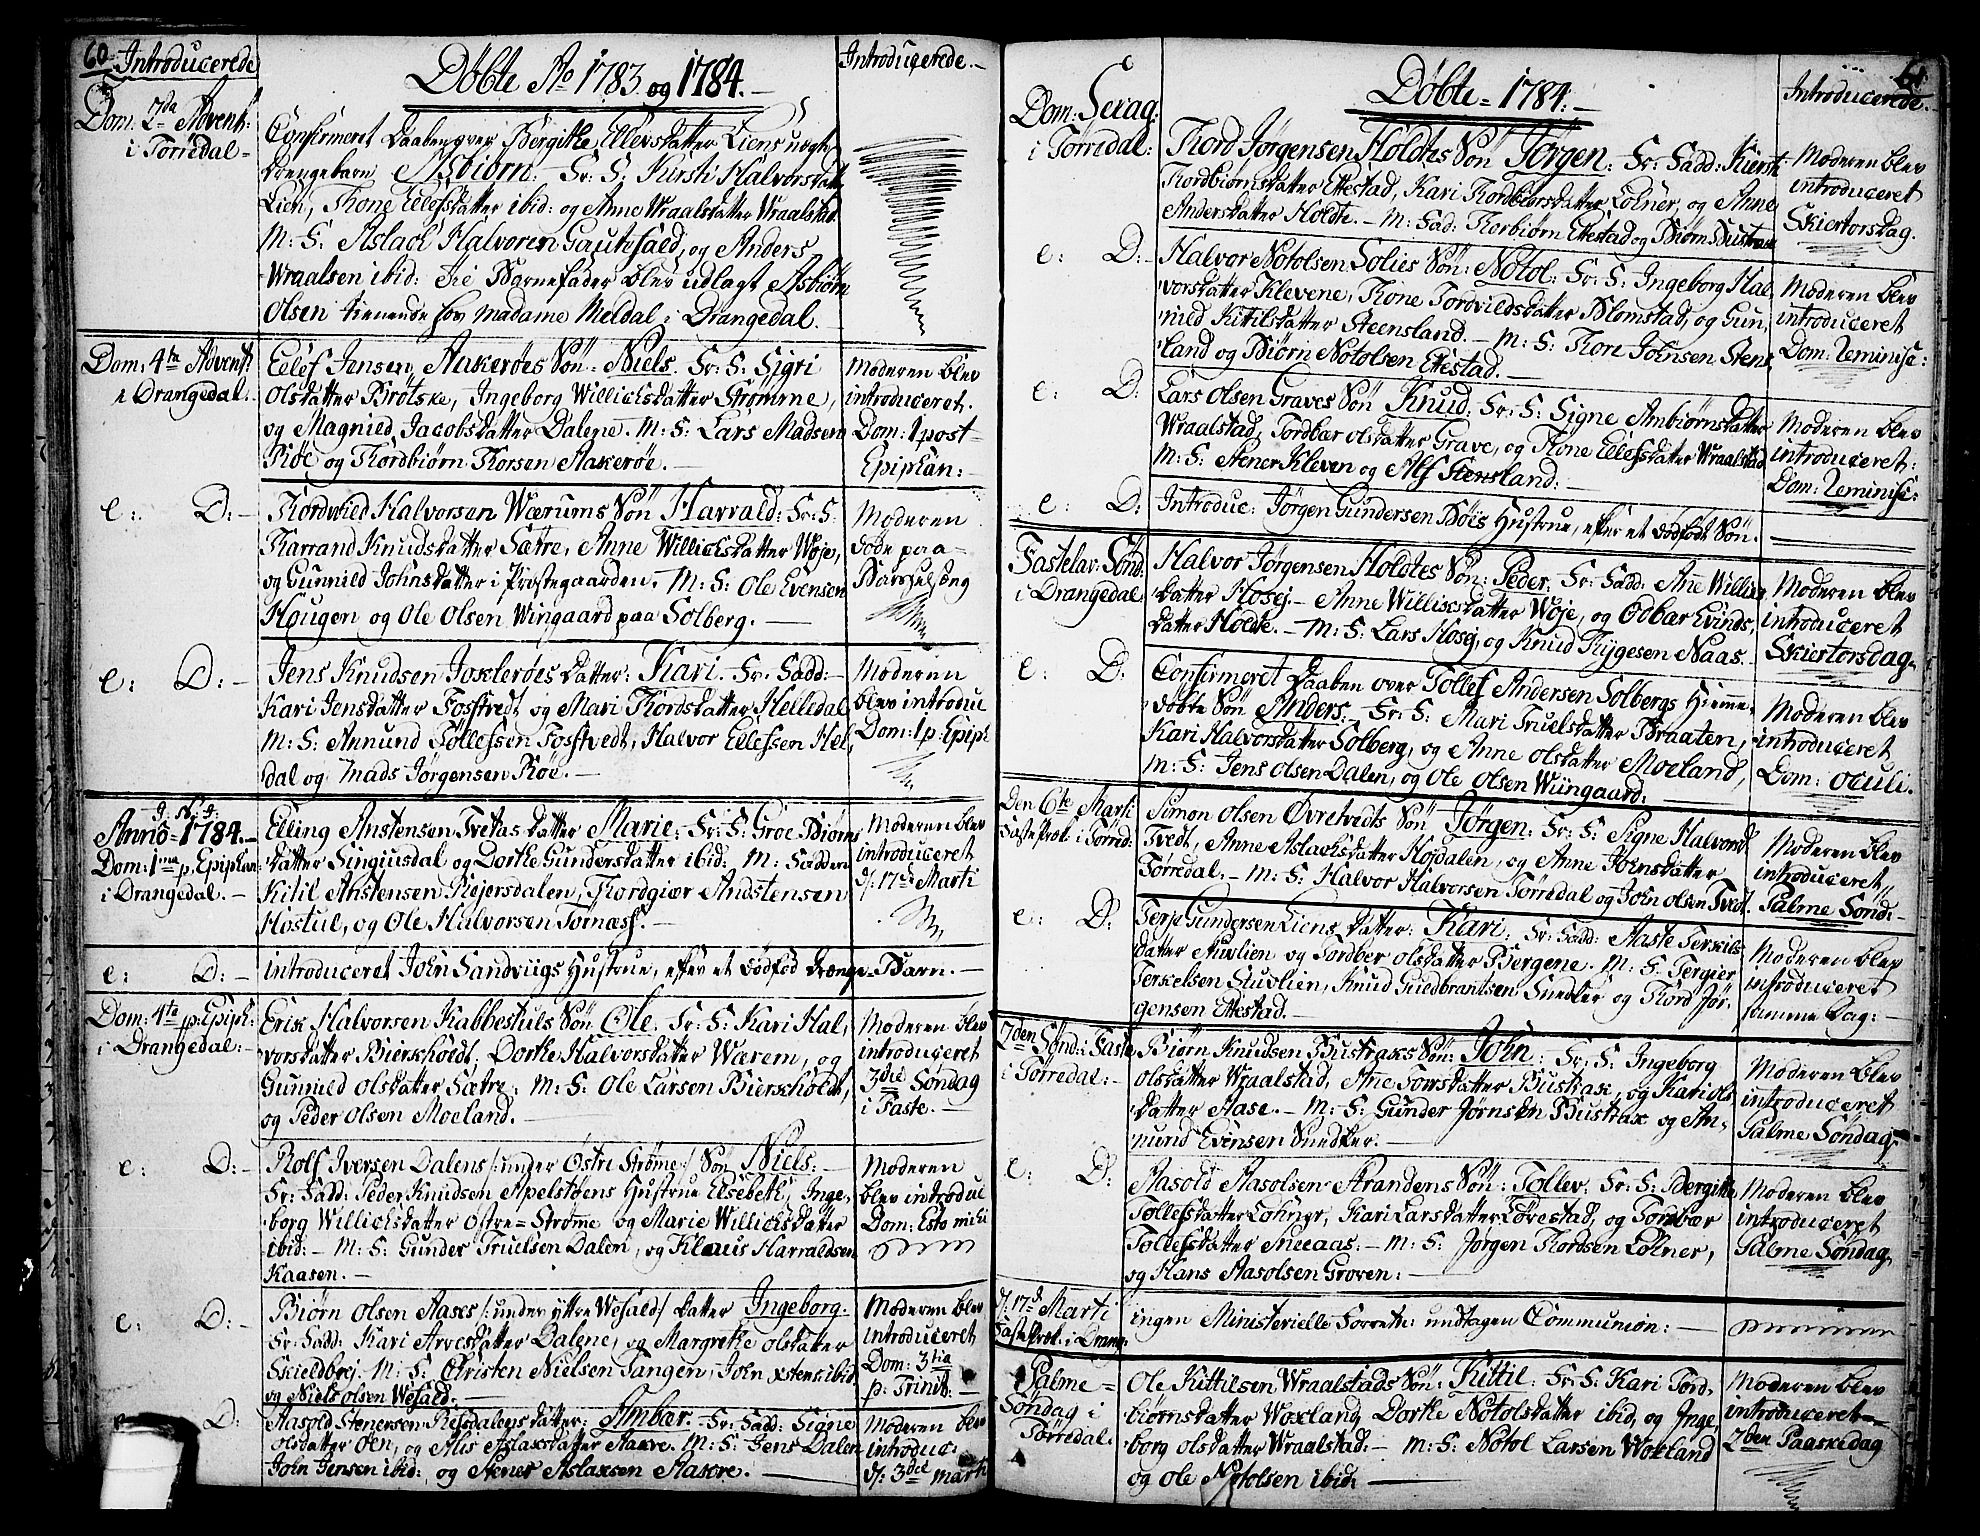 SAKO, Drangedal kirkebøker, F/Fa/L0003: Ministerialbok nr. 3, 1768-1814, s. 60-61